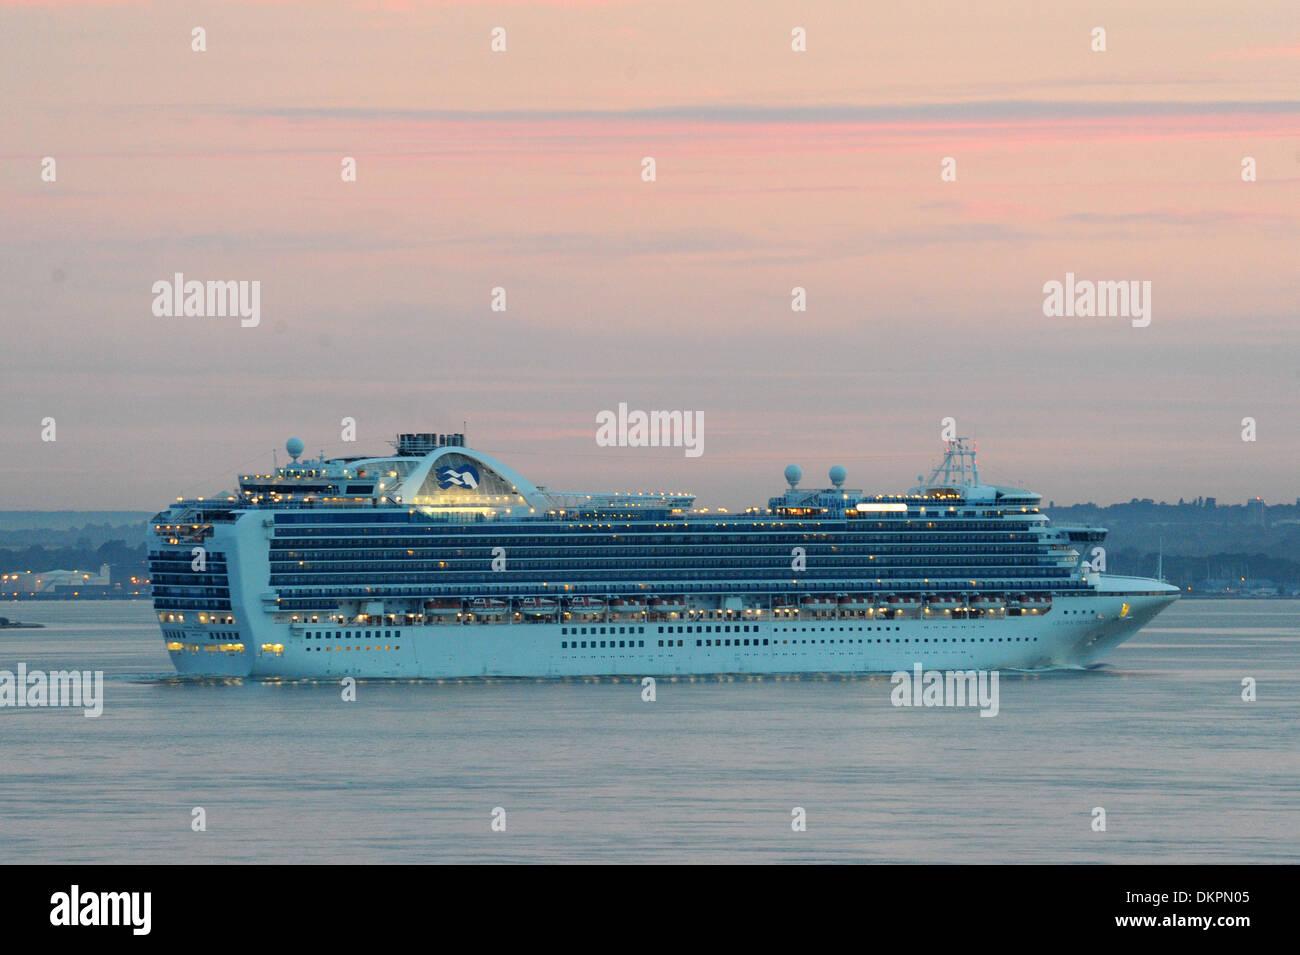 Crown Princess cruise ship arrives at Southampton